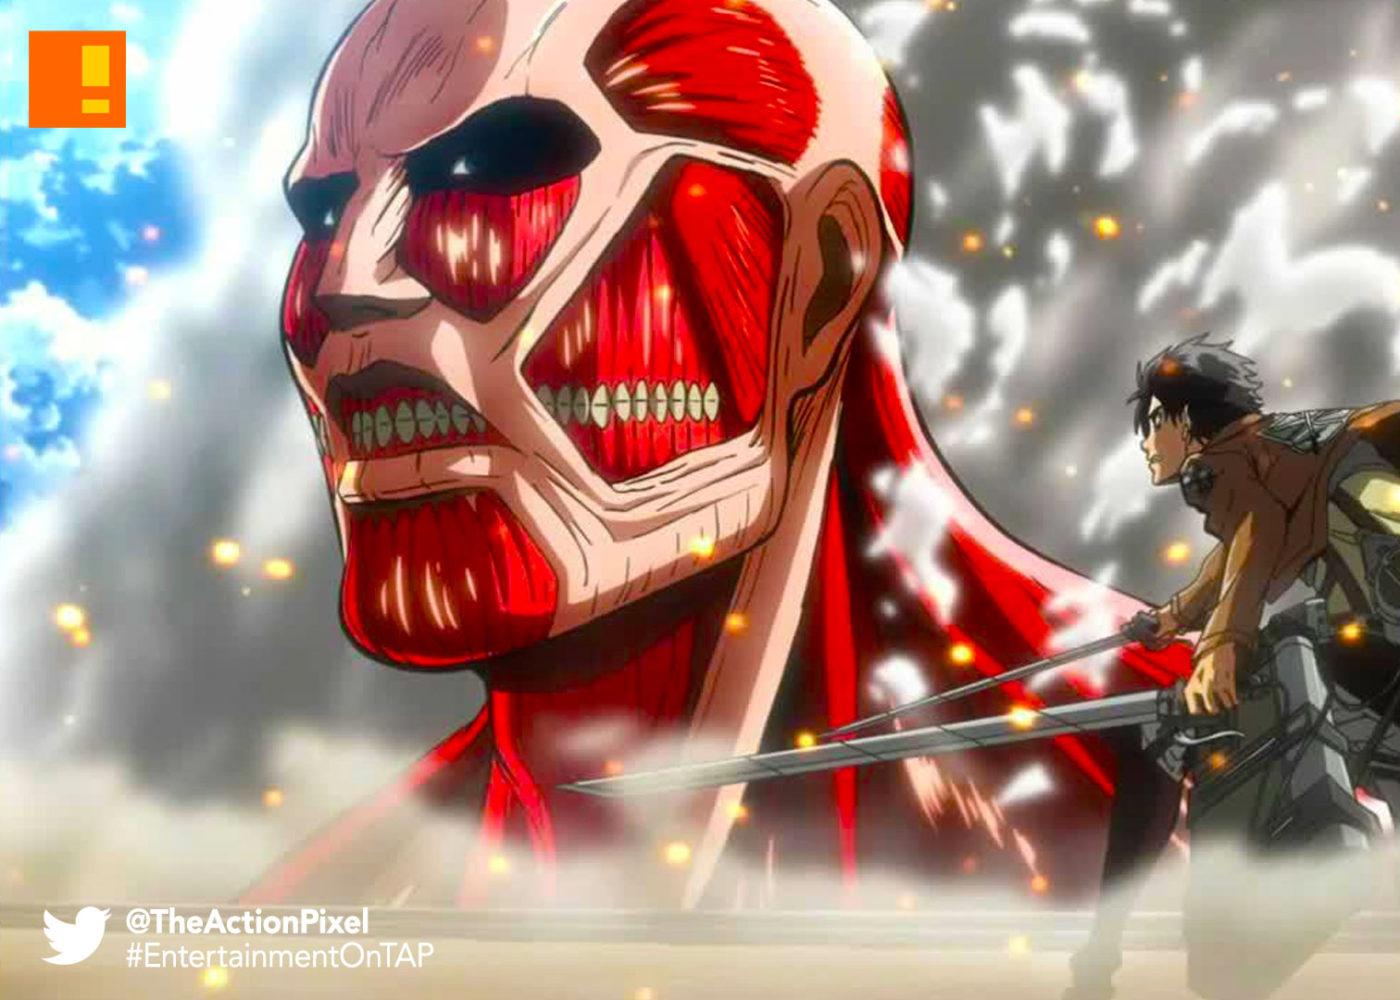 attack on titan, Masashi Koizuka, Tetsuro Araki, manga , anime, Kodansha Comics, the action pixel, entertainment on tap,